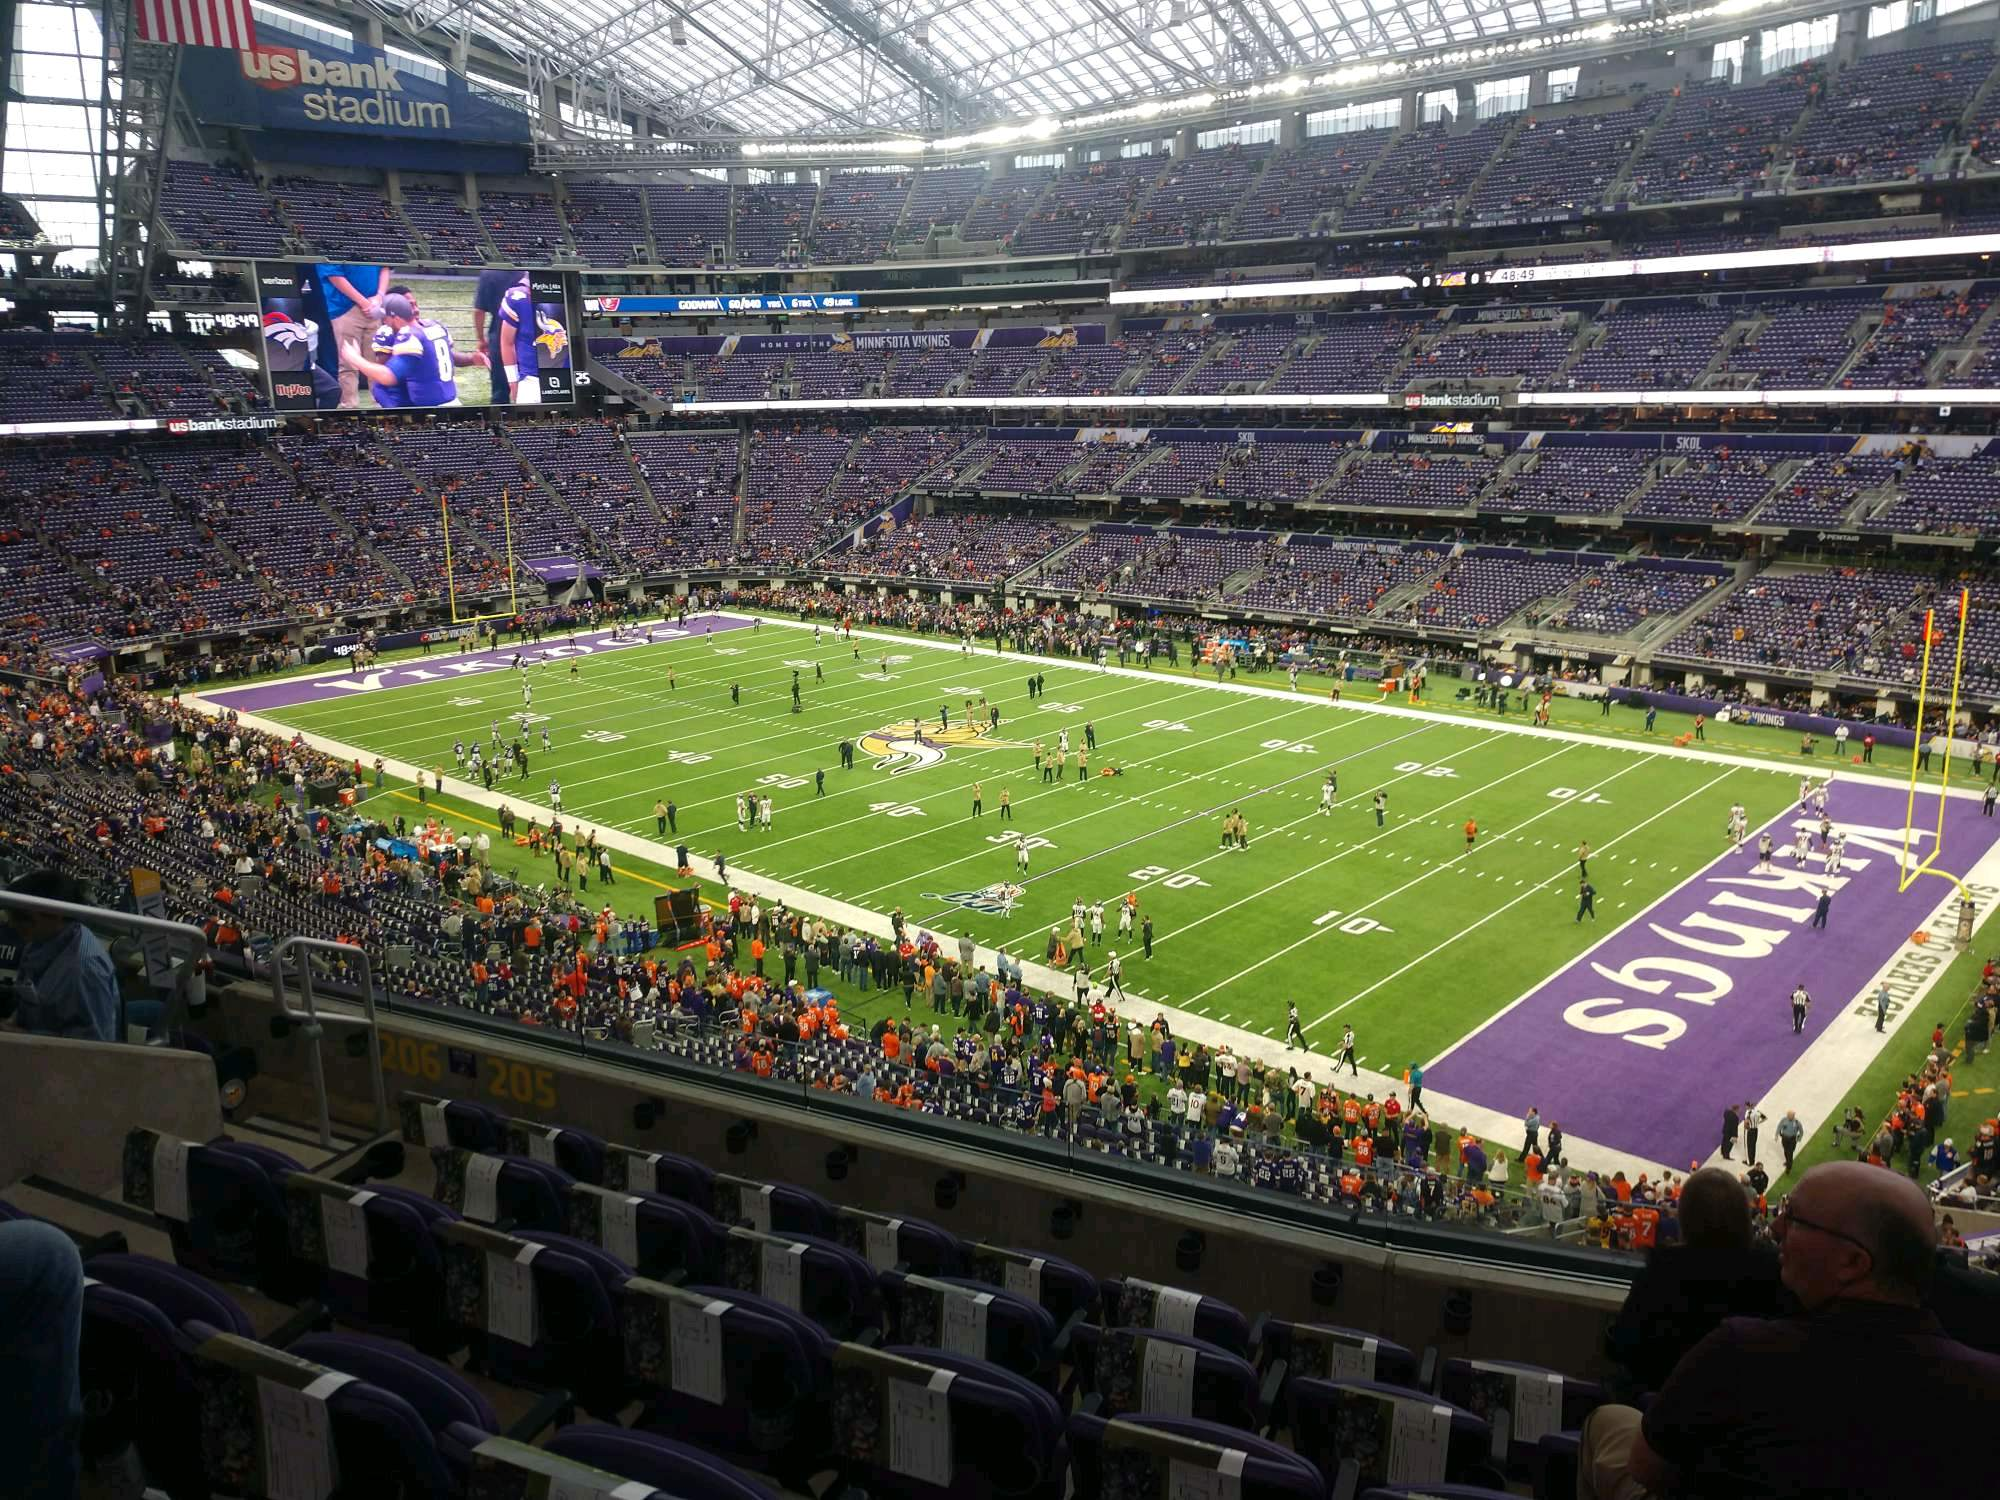 U.S. Bank Stadium Section 205 Row 6 Seat 9